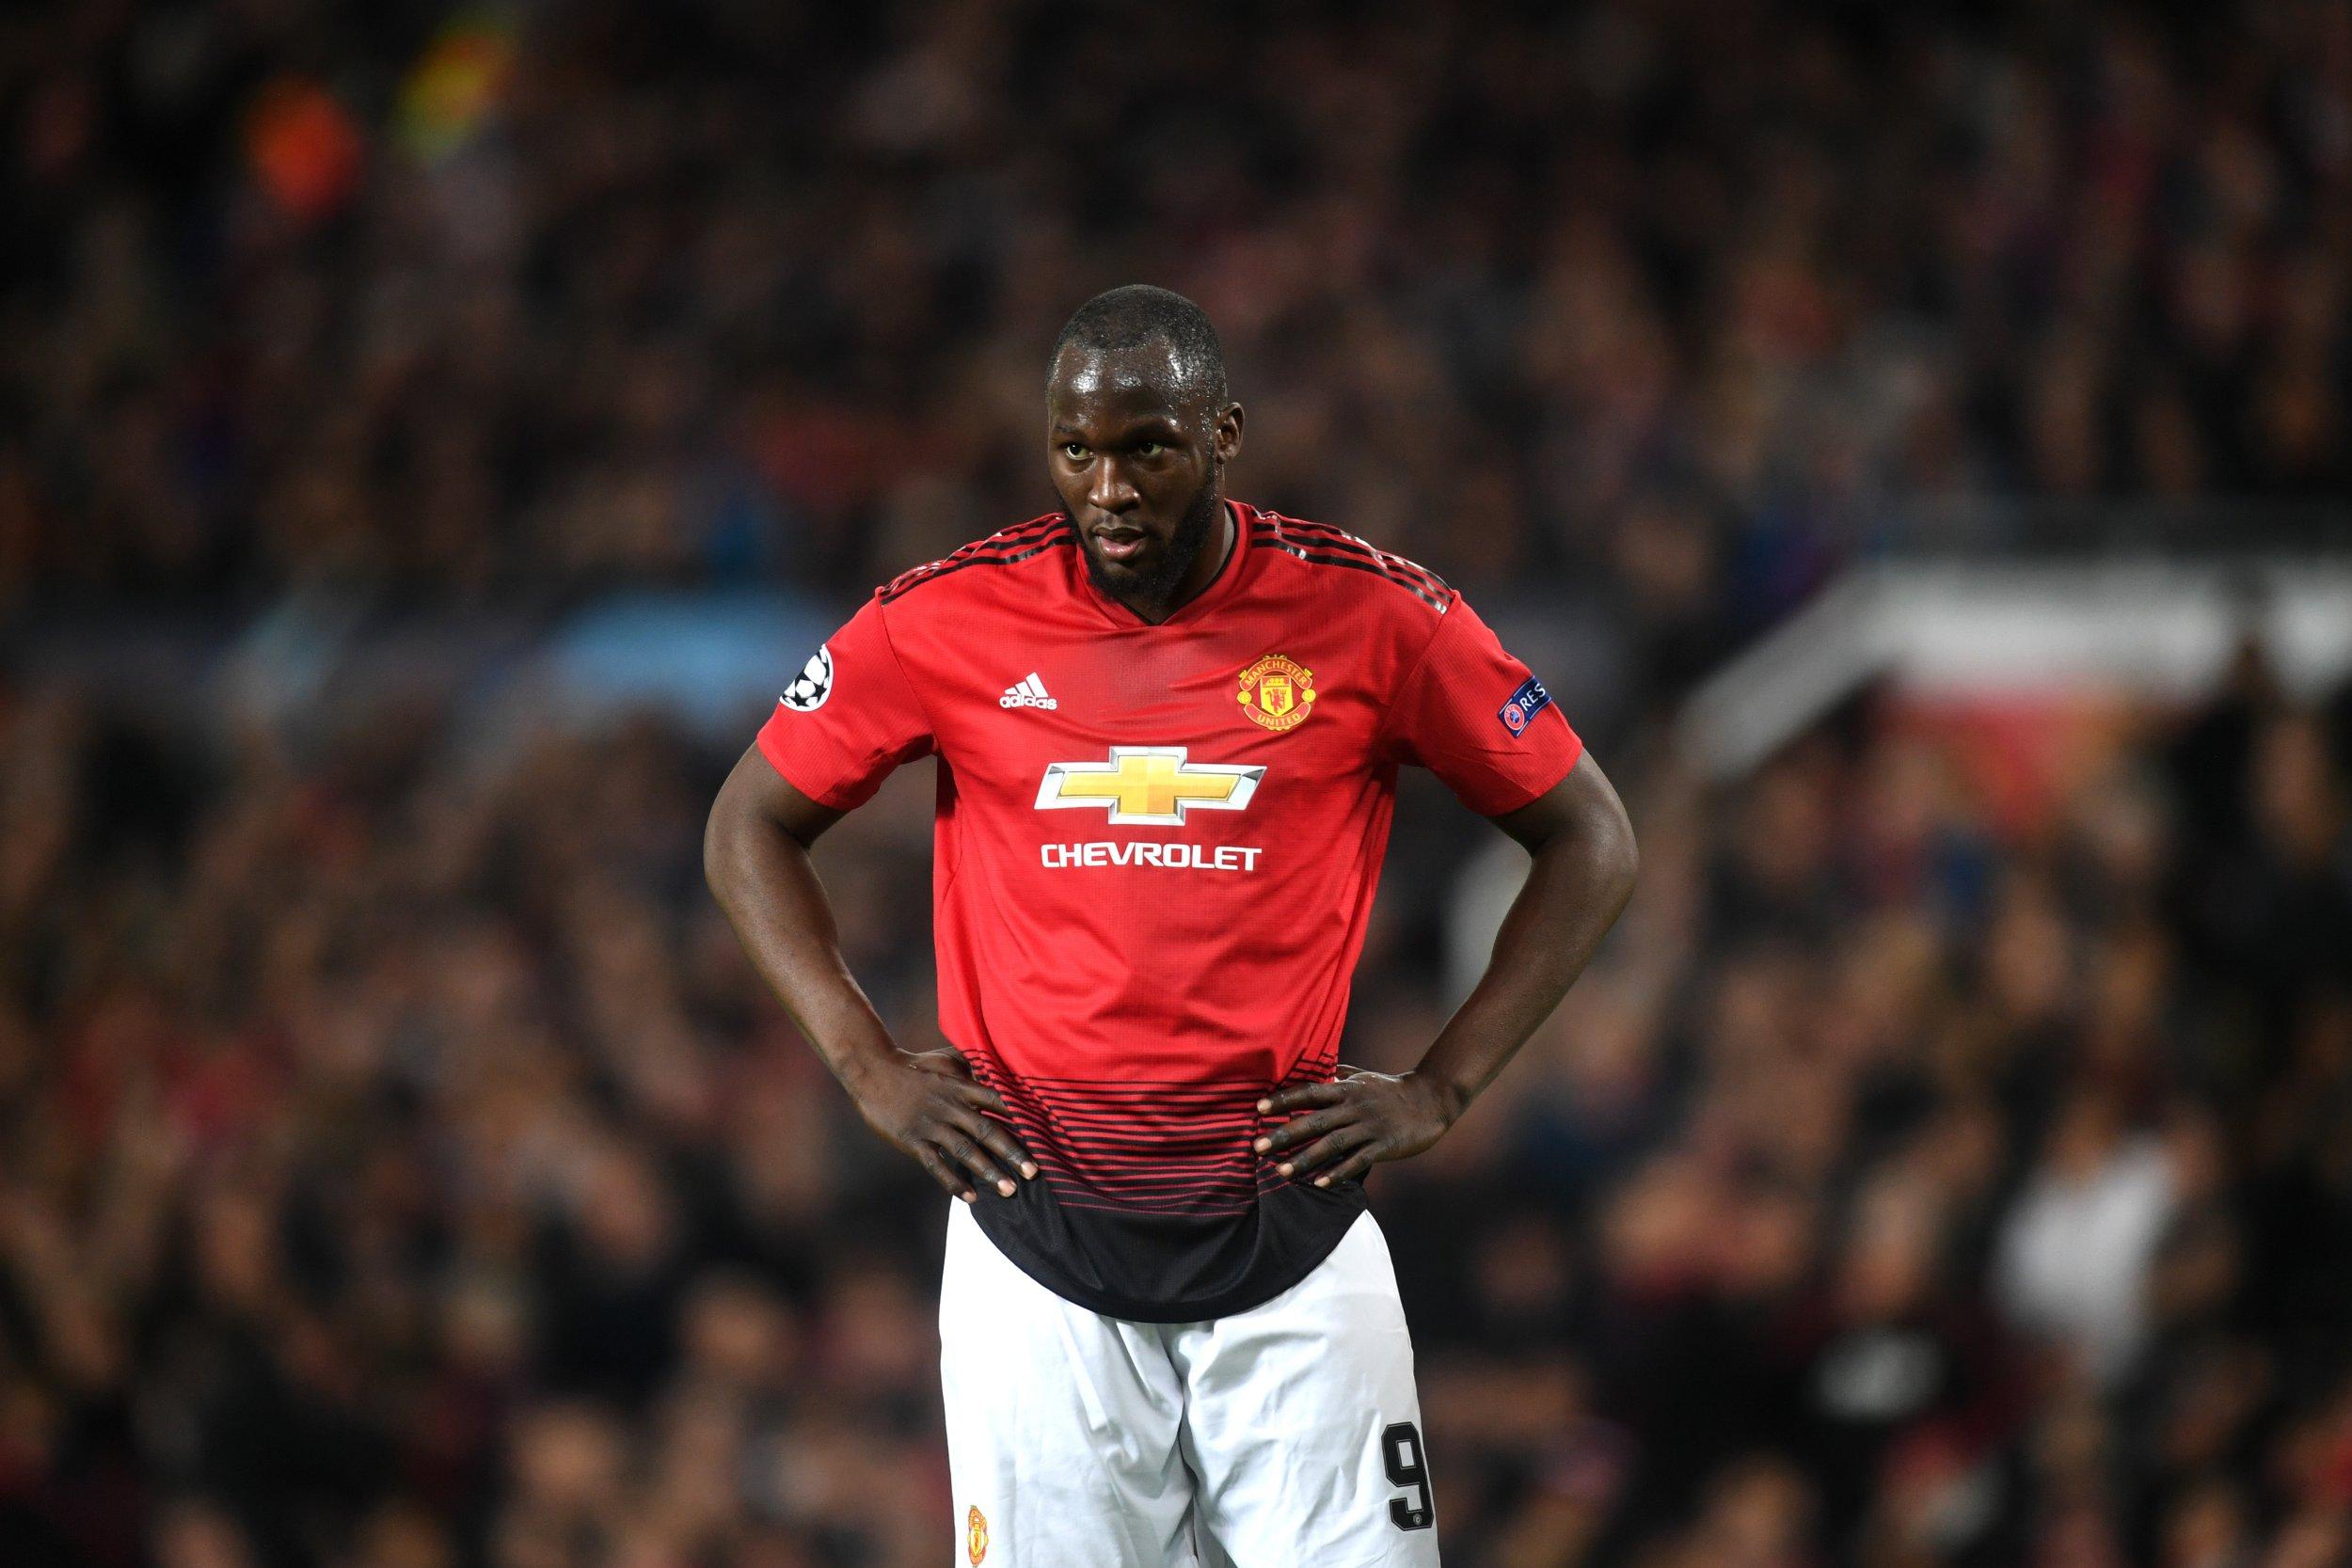 Romelu Lukaku fires warning to Manchester United teammates after Barcelona defeat